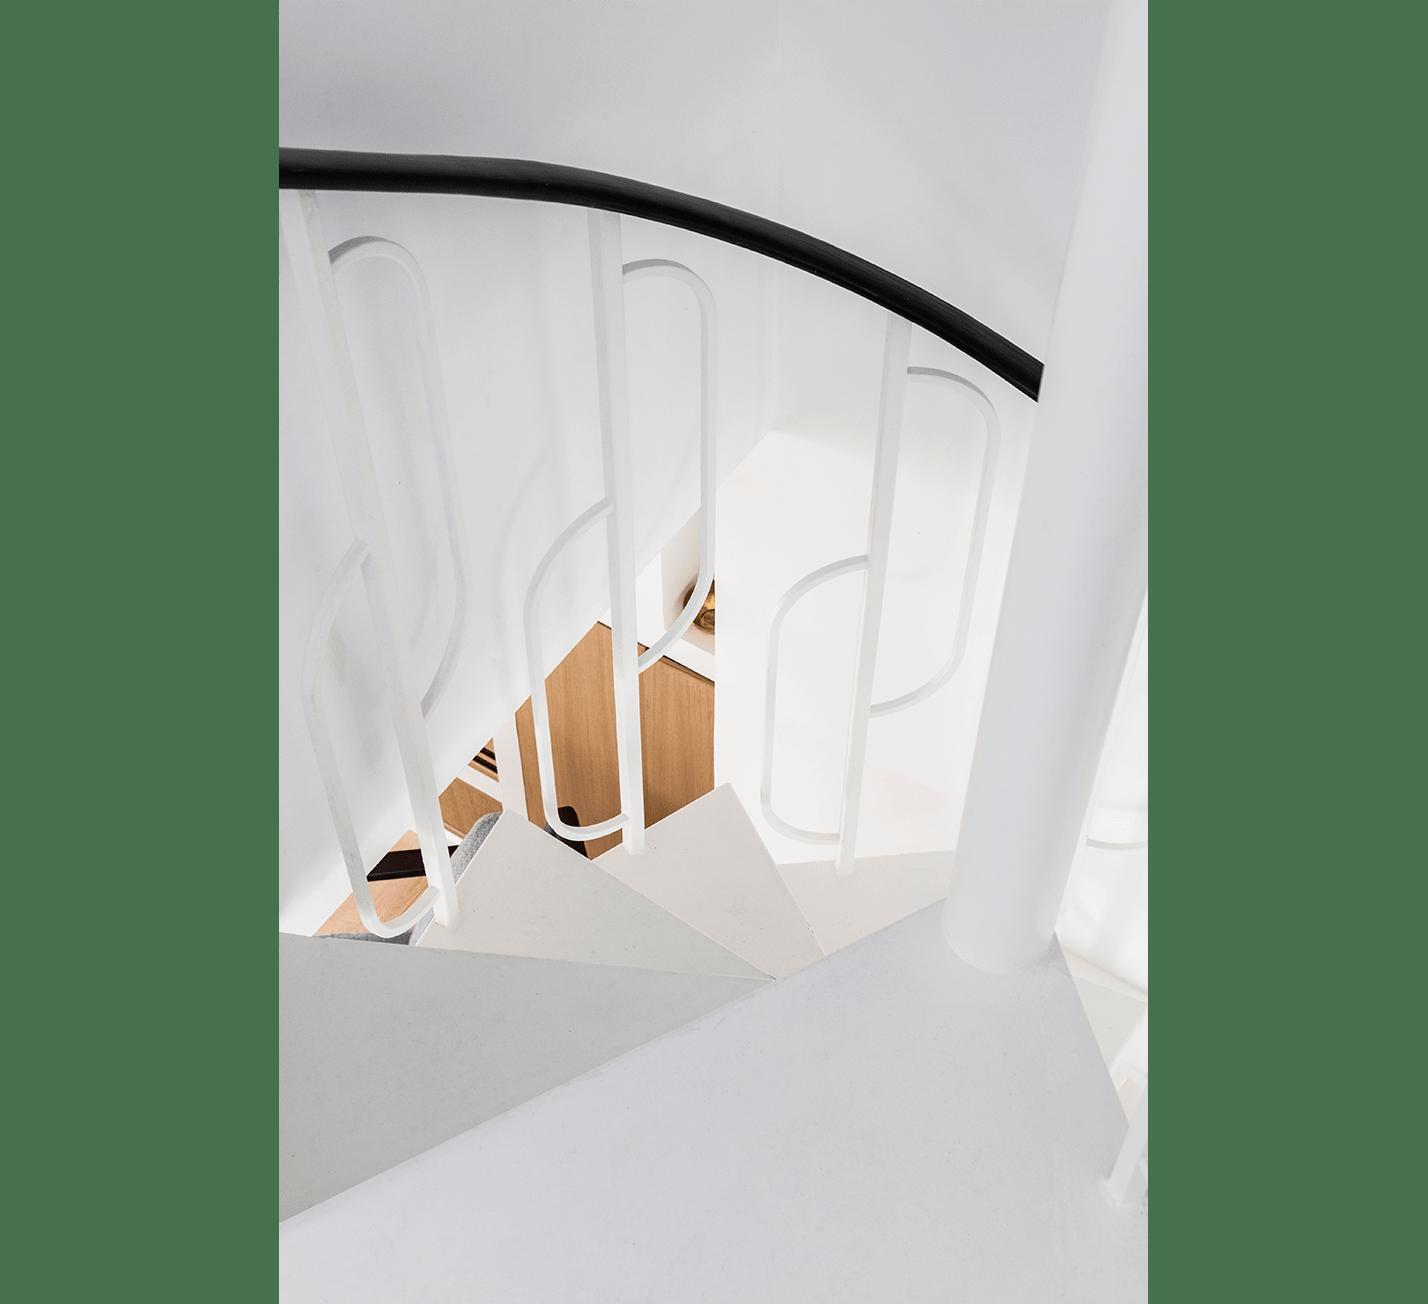 Projet-Germaine-Atelier-Steve-Pauline-Borgia-Architecte-interieur-11-min